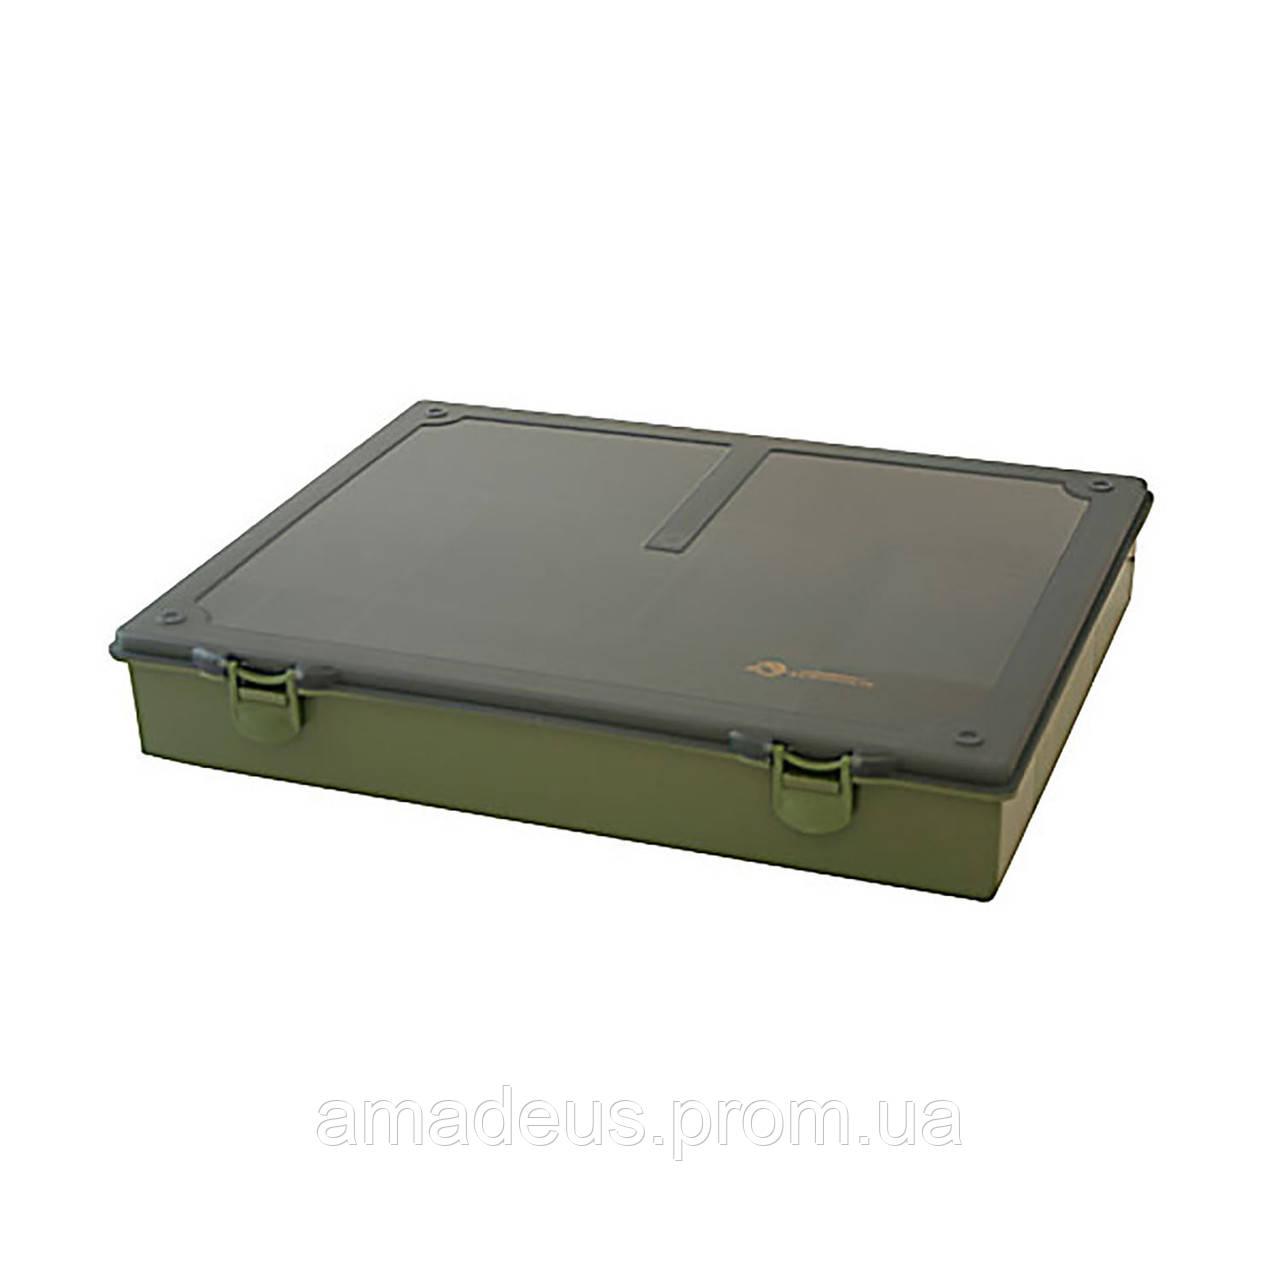 Коробка (бокс) для карповой рыбалки КБ-1